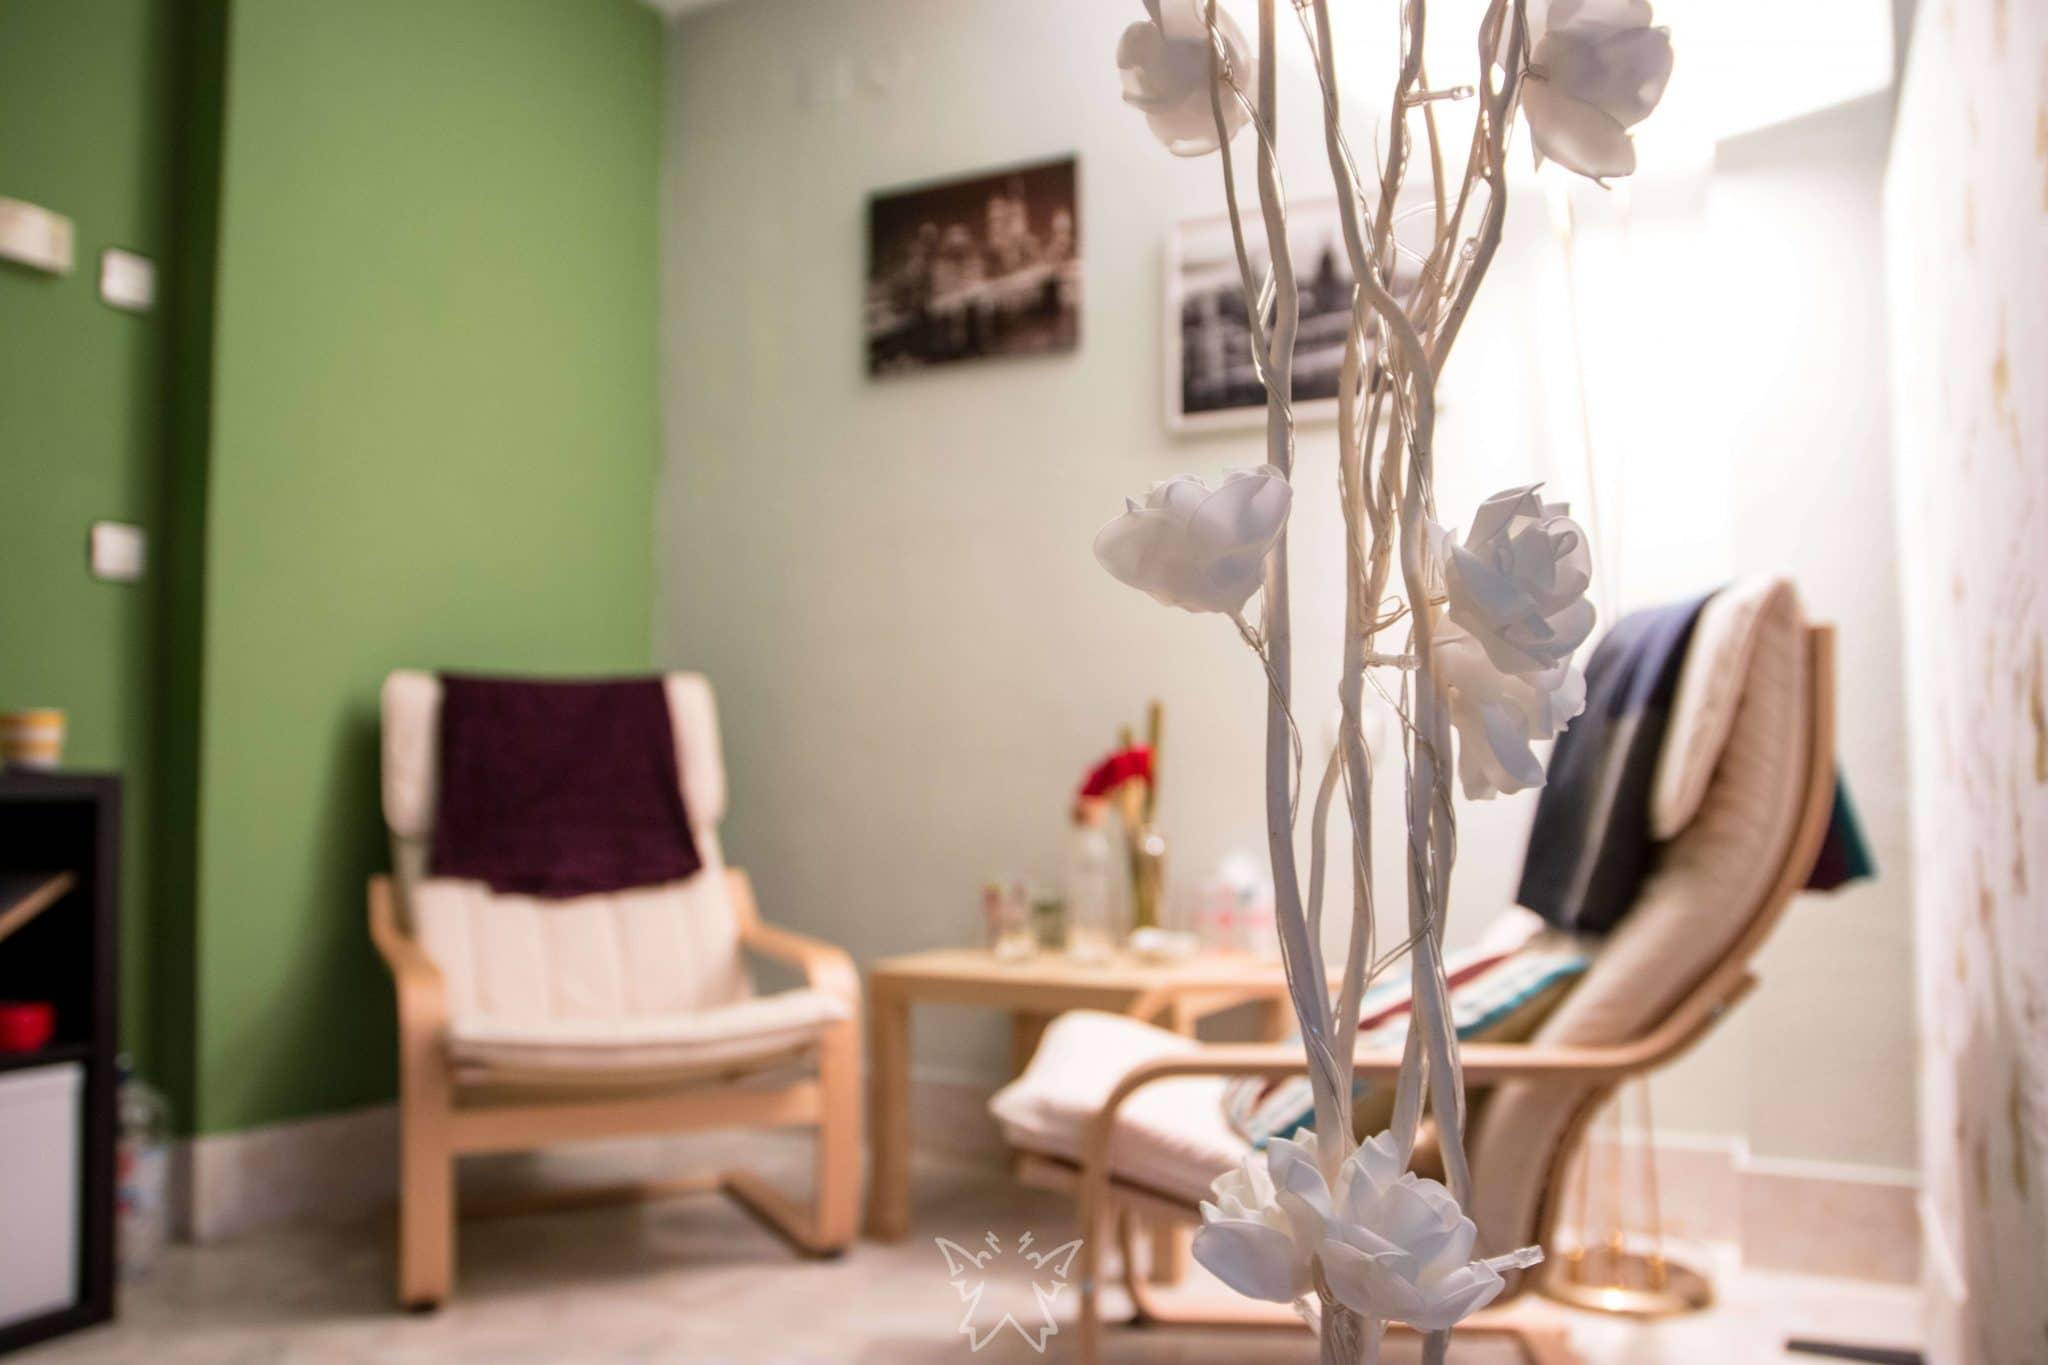 Psicoterapia en Burgos